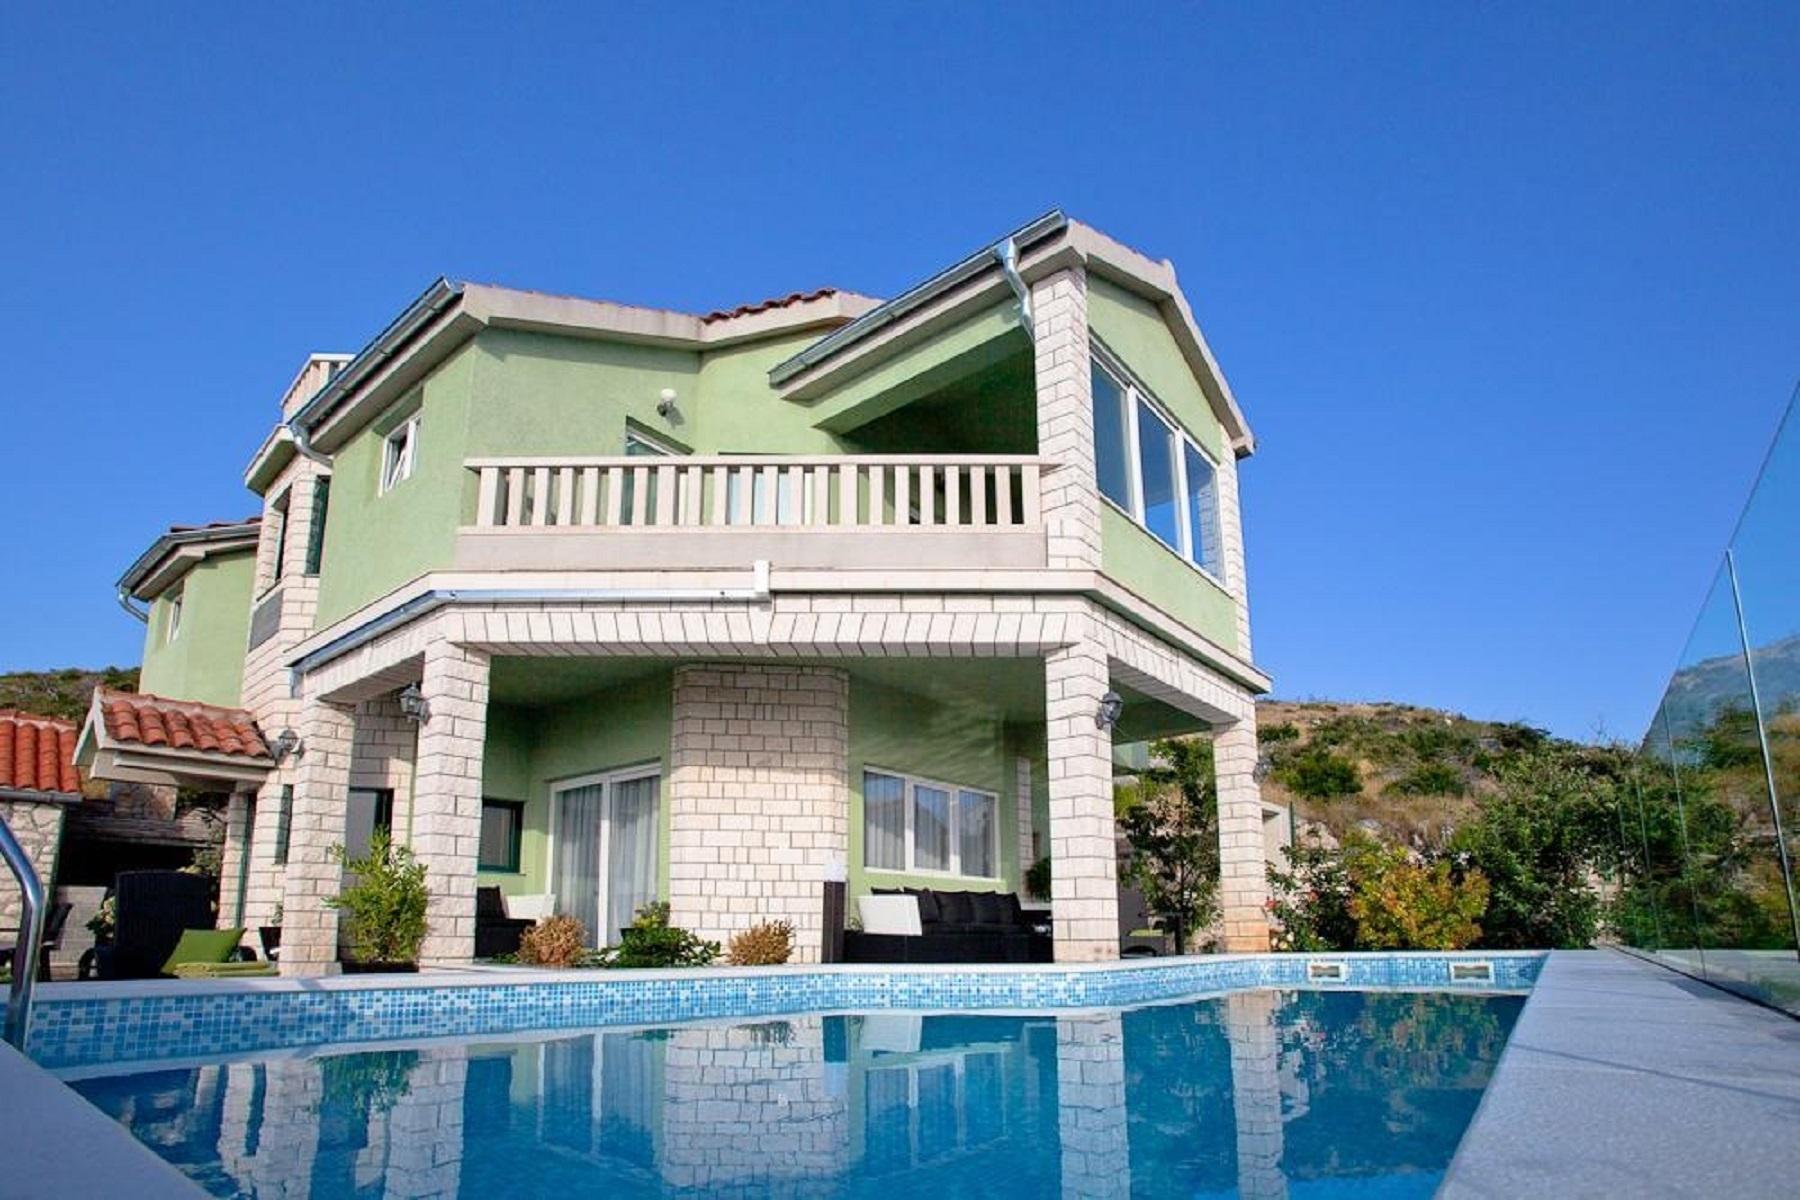 Villy/Dovolenkové domy, Bilo, Primošten - Dovolenkové domy, vily  Filippo - with pool :